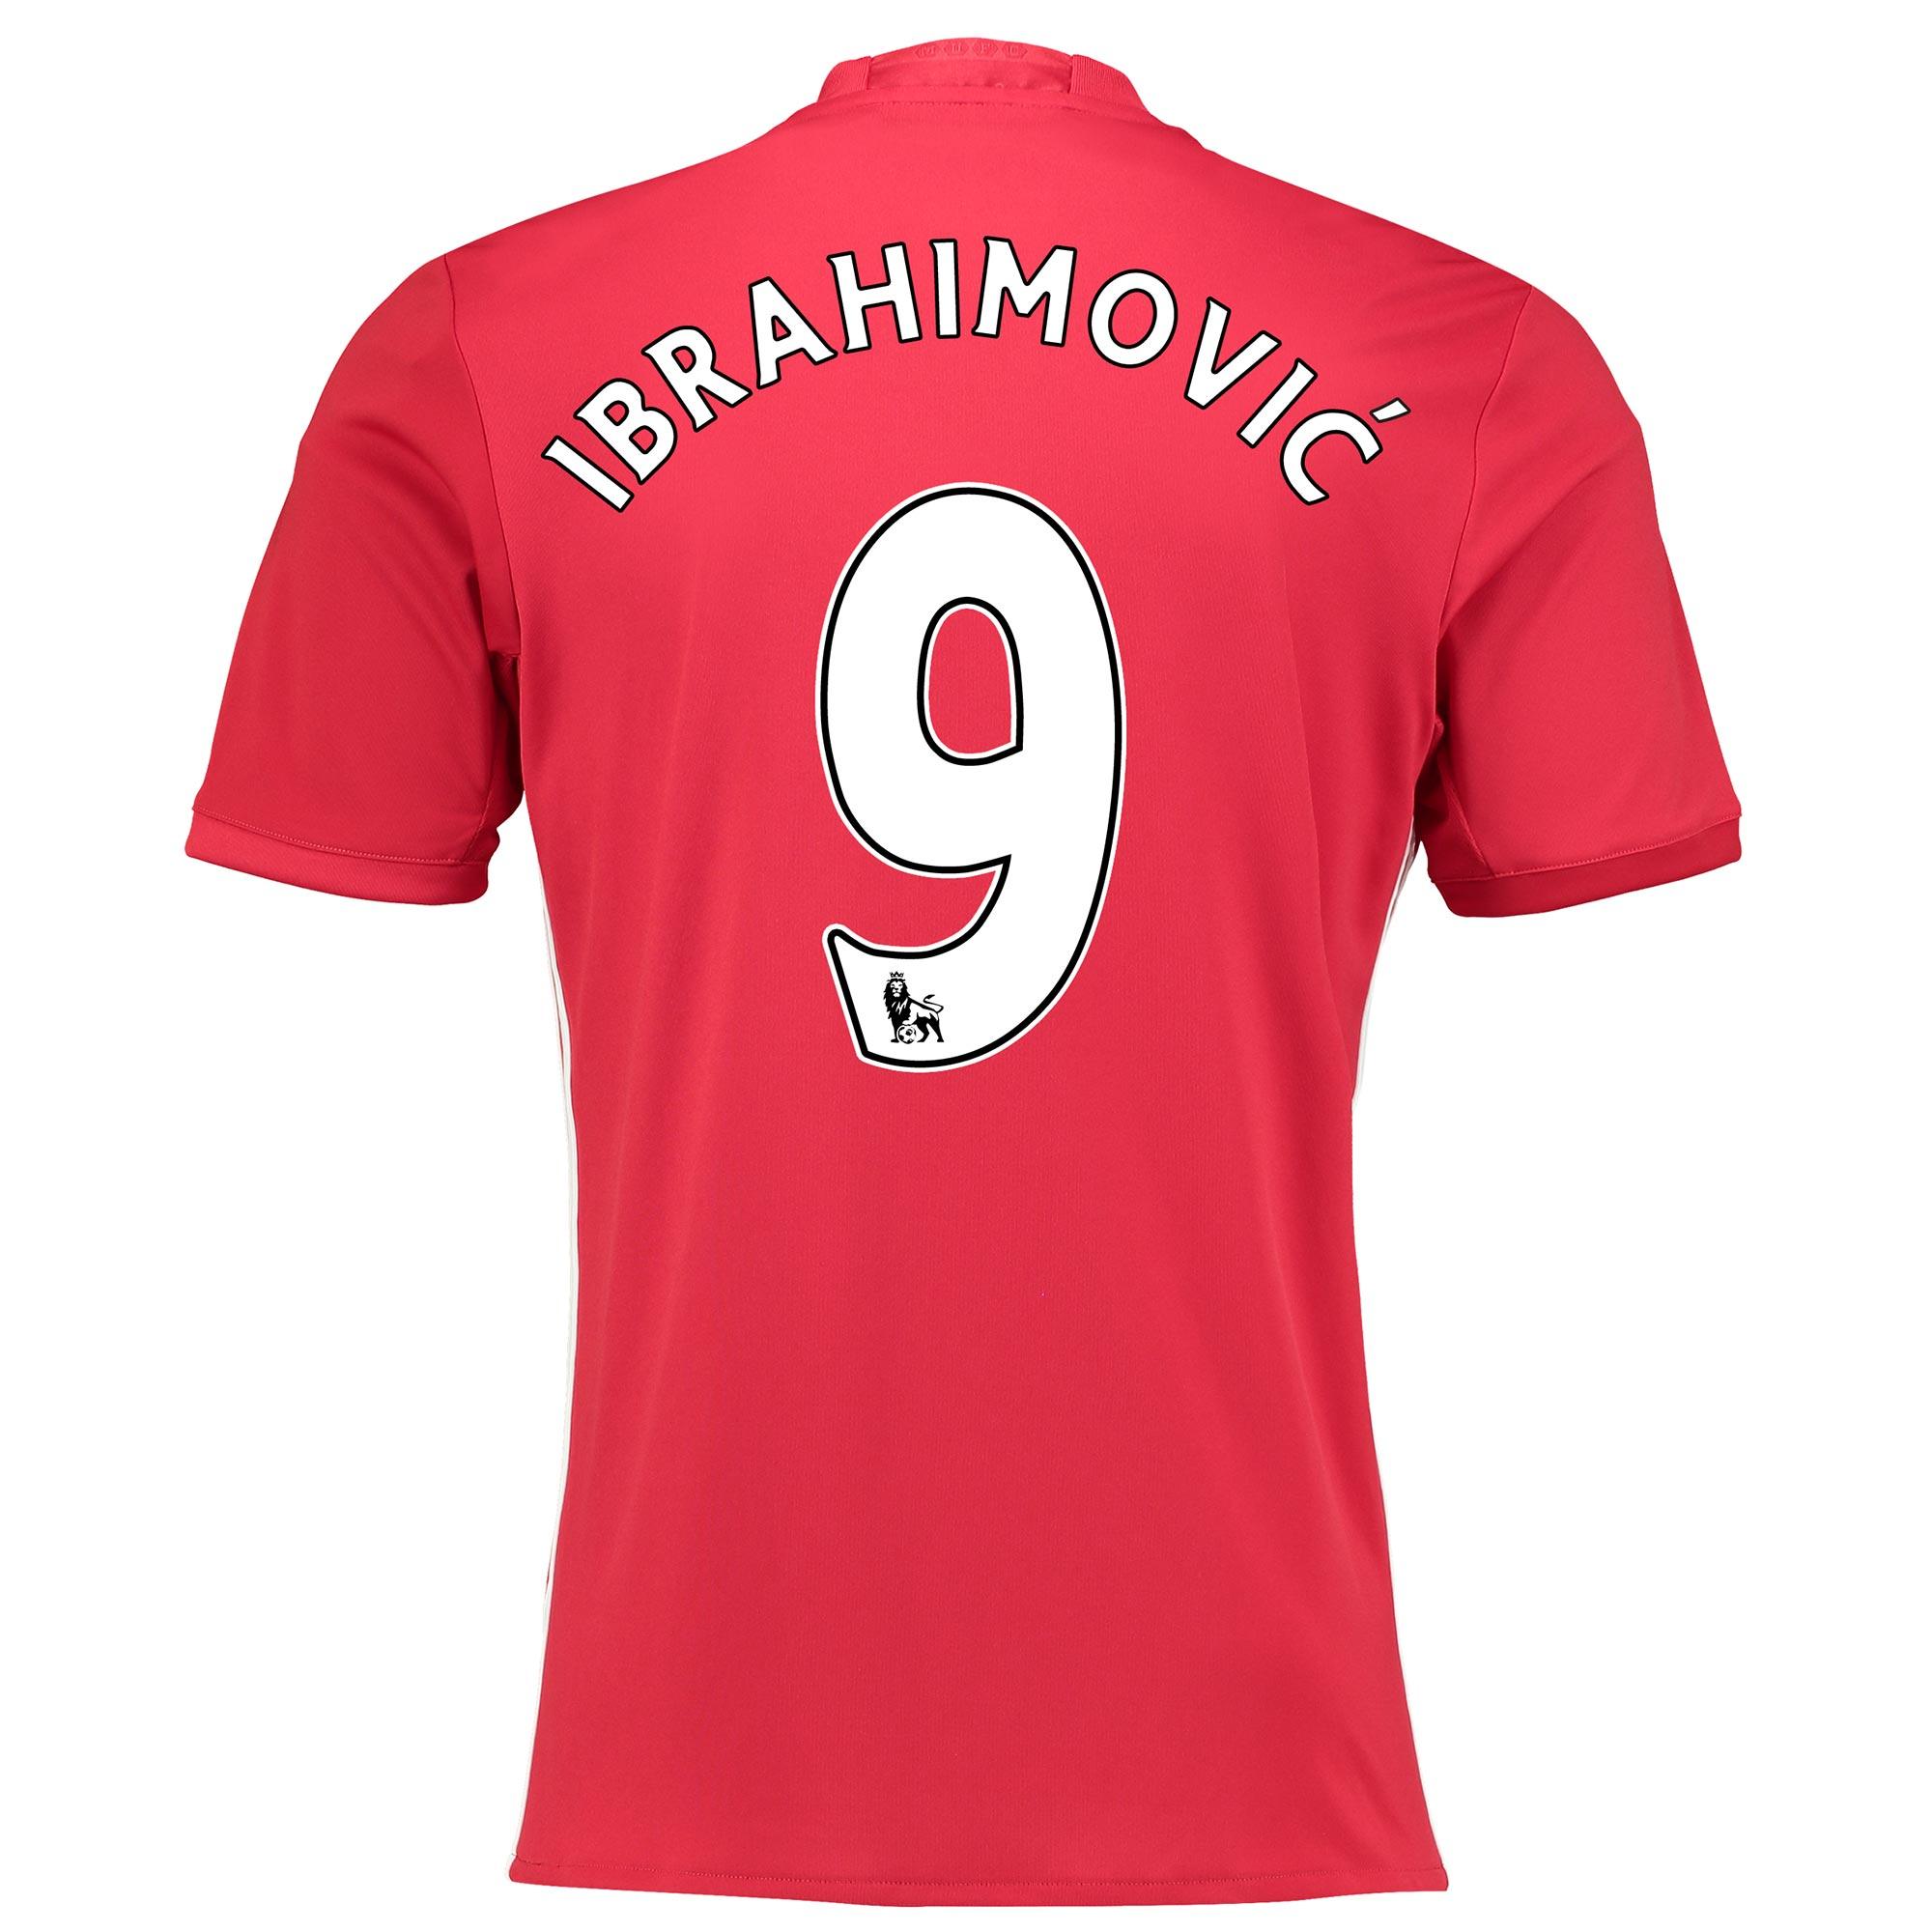 Manchester United Heimtrikot 2016-17 - Ibrahimovic 9